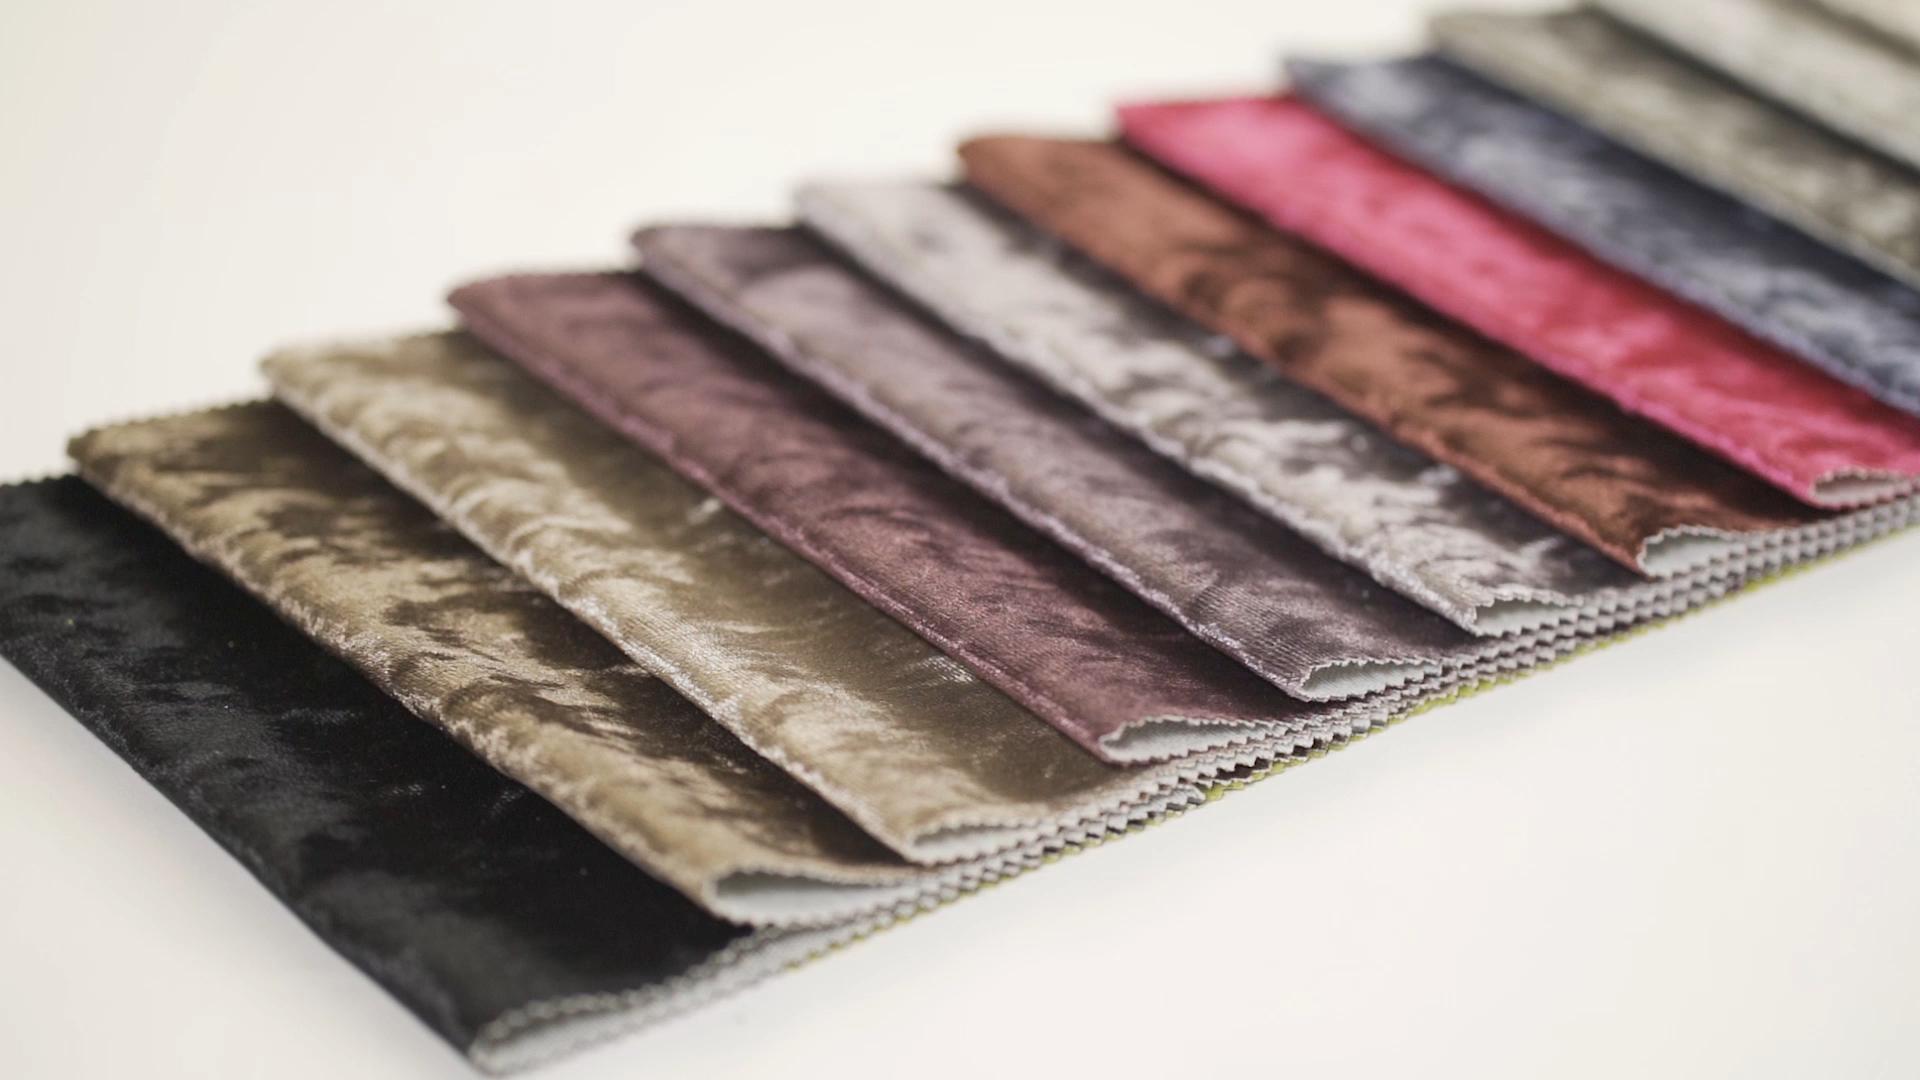 Zhejiang Manufacture Sinovel  Ice Crush Velvet Upholstery Fabric Printed for Sofa  Beed Frame Decoration